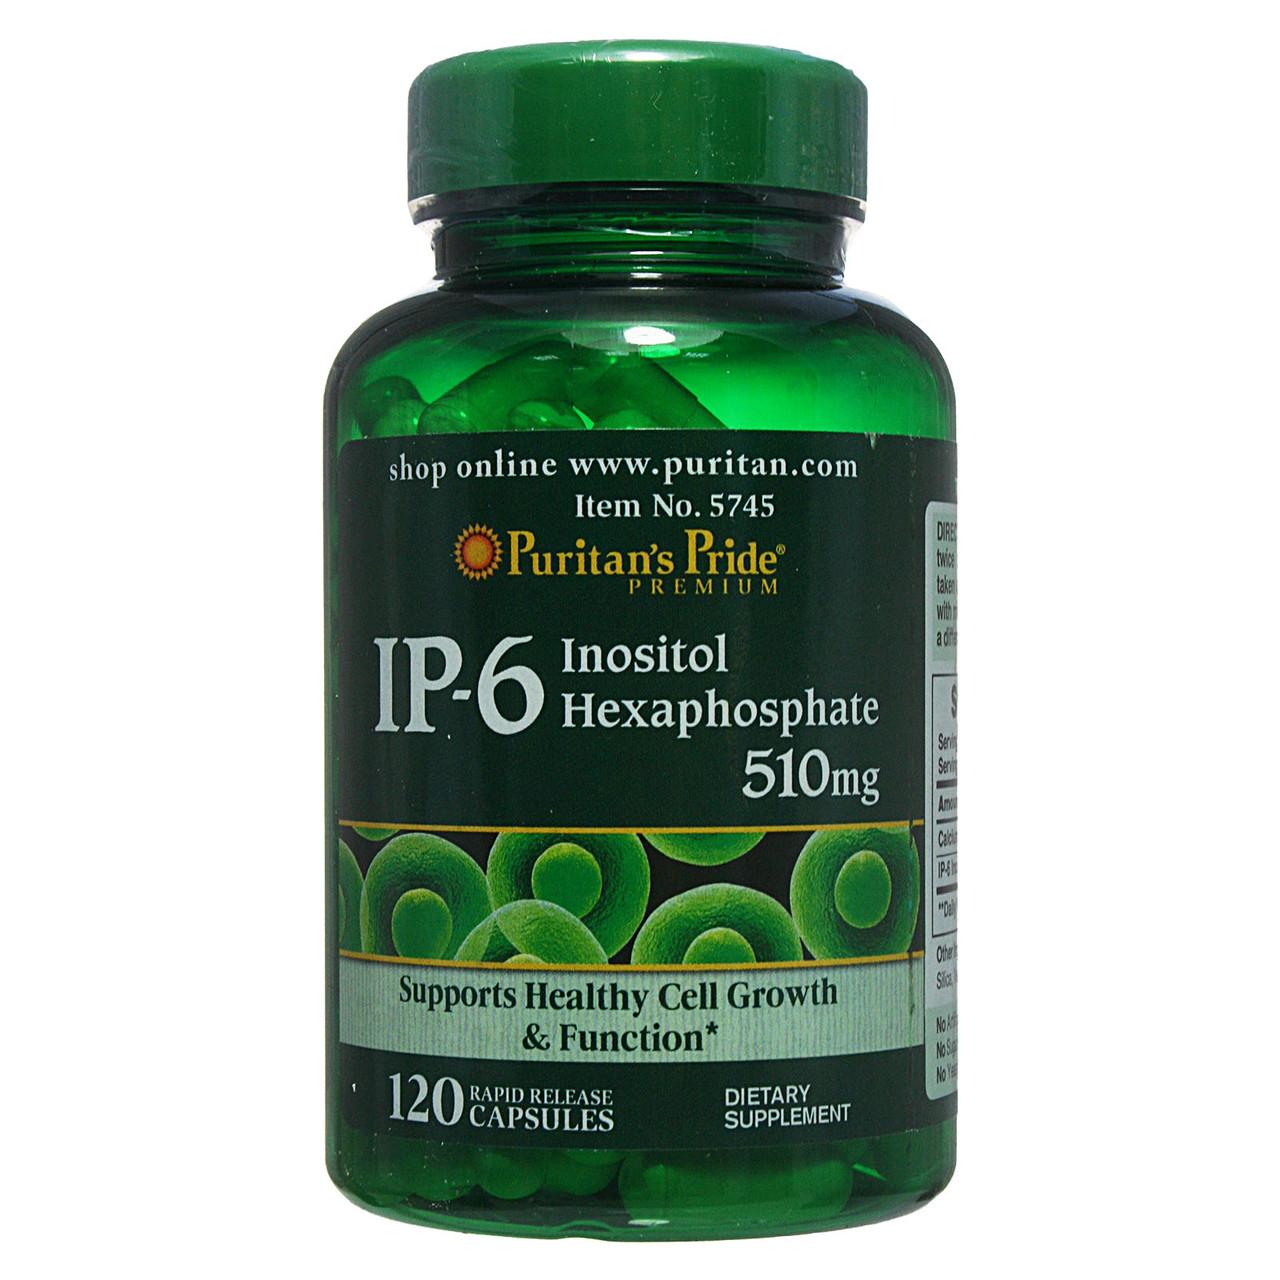 Інозитол, IP-6 Inositol Hexaphosphate 510 mg, Puritan's Pride, 120 капсул